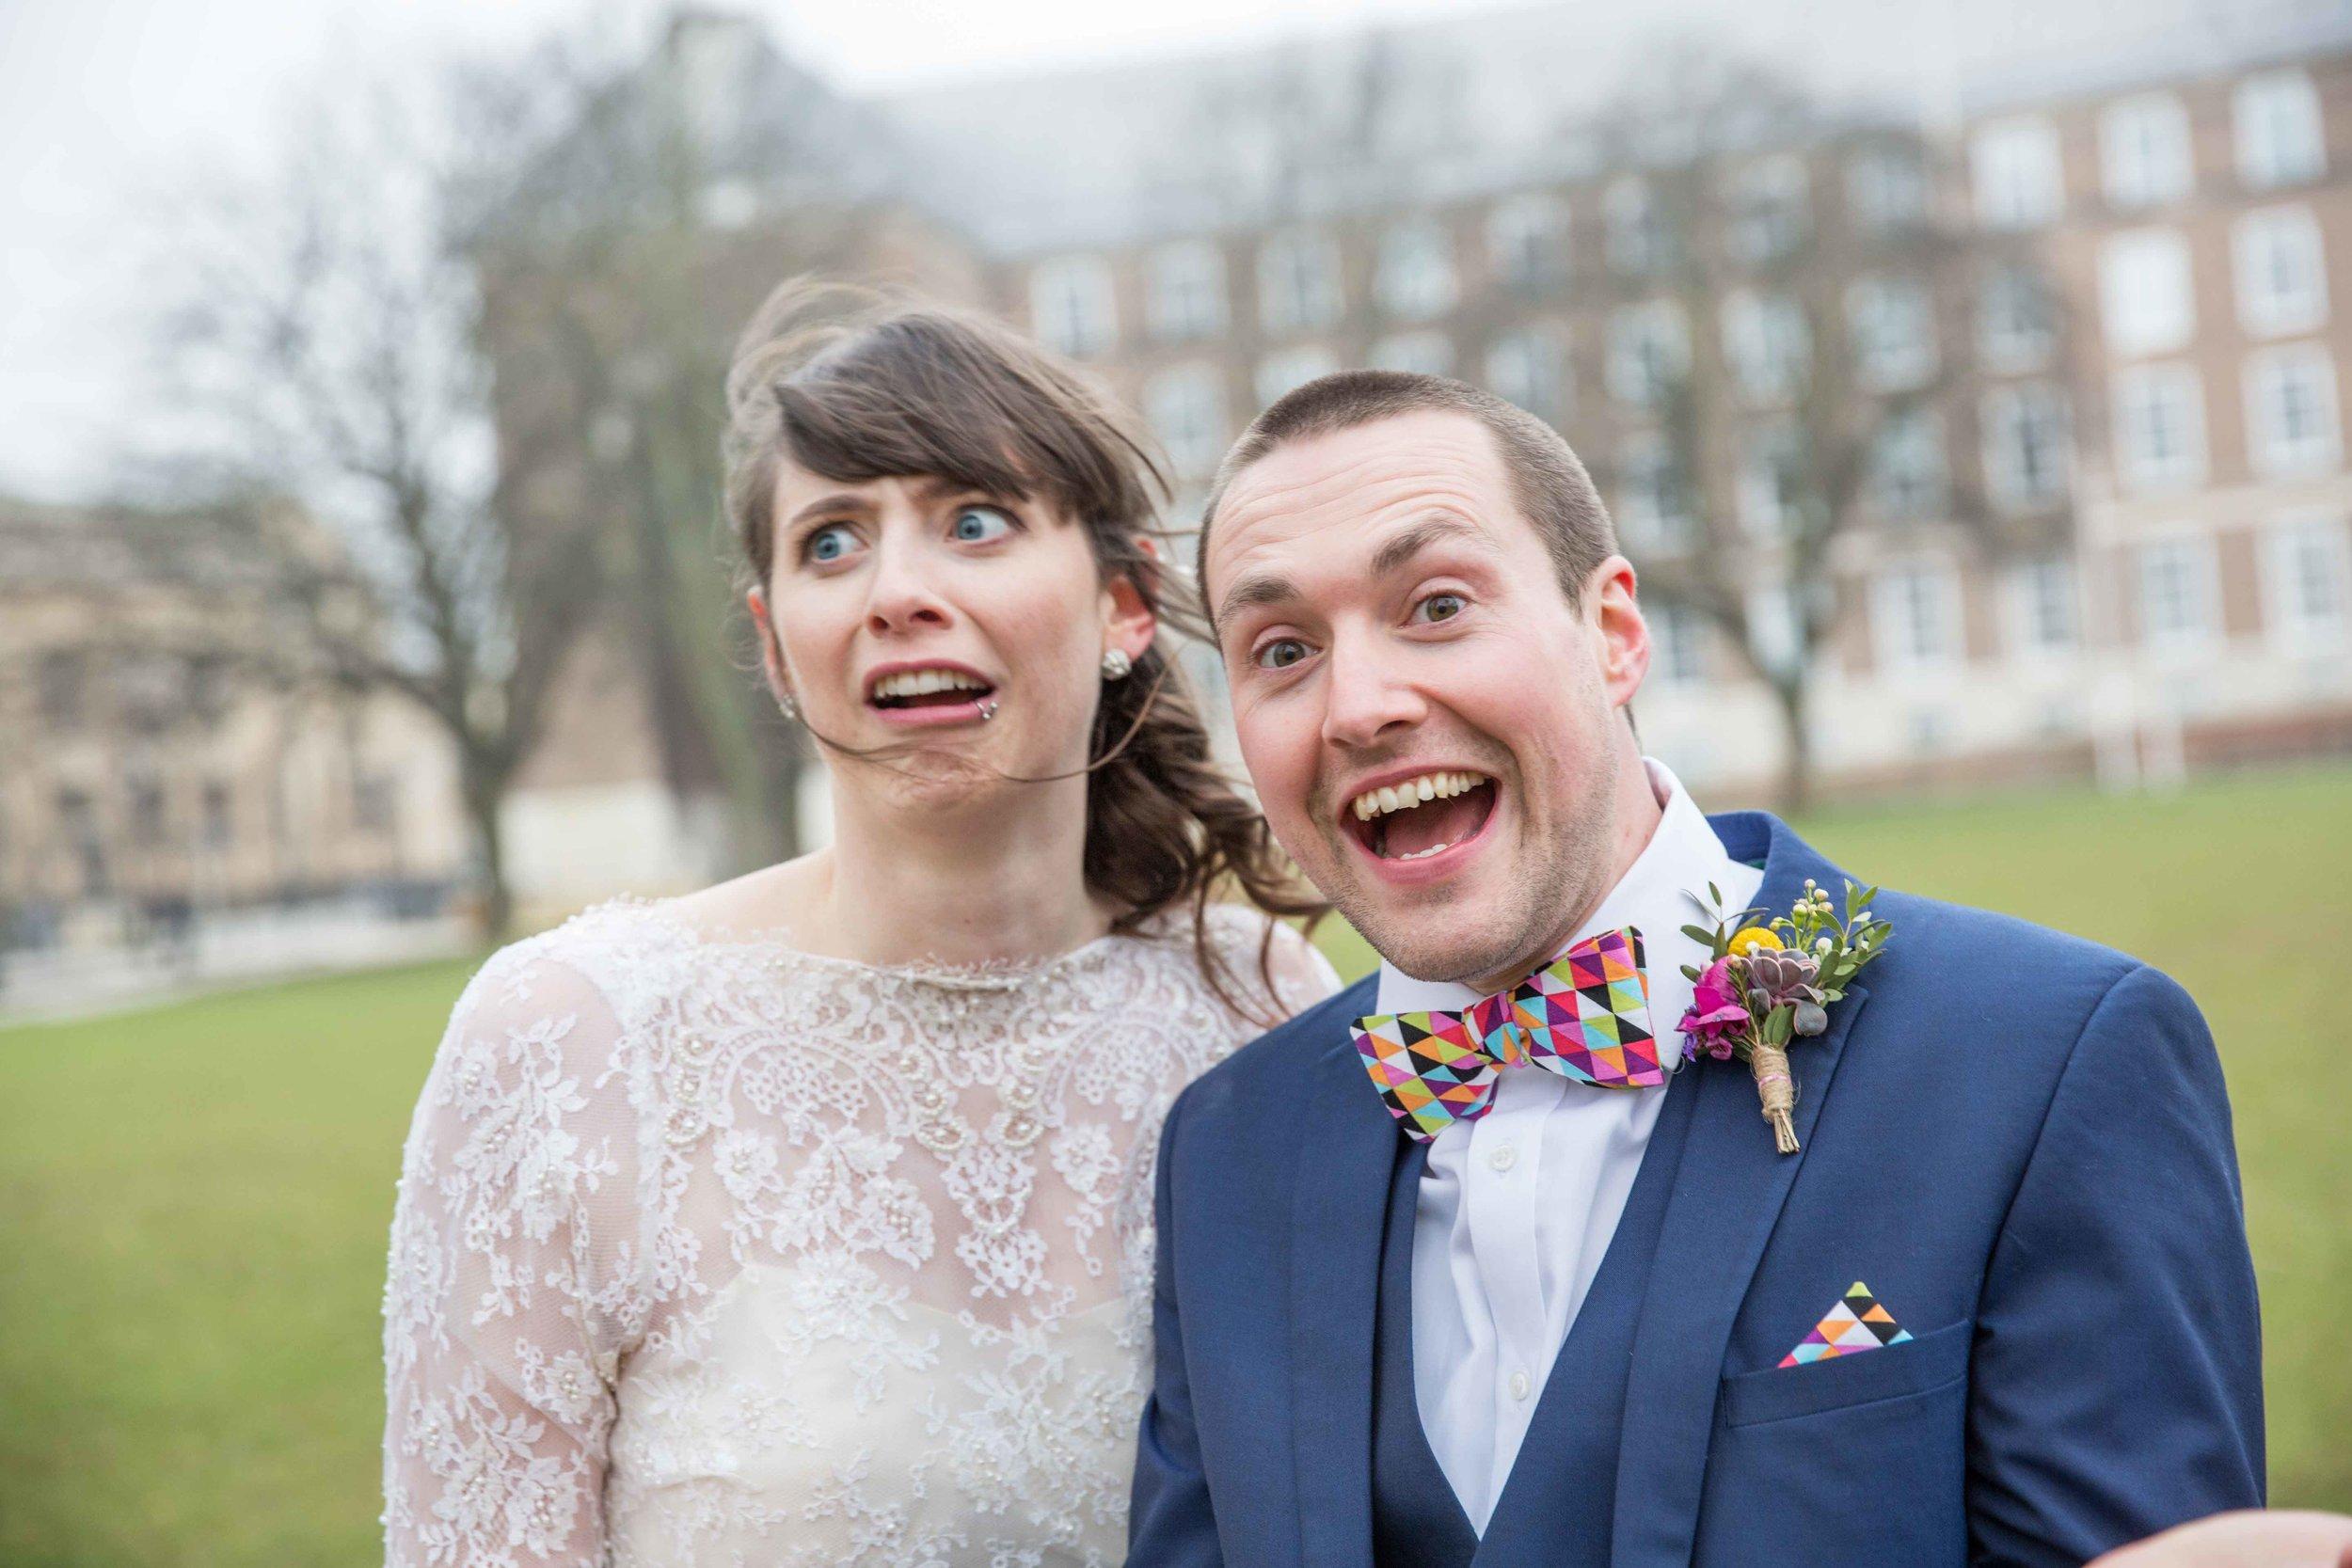 Adam & Faye - Wright Wedding Photography - Bristol Wedding Photographer -277.jpg